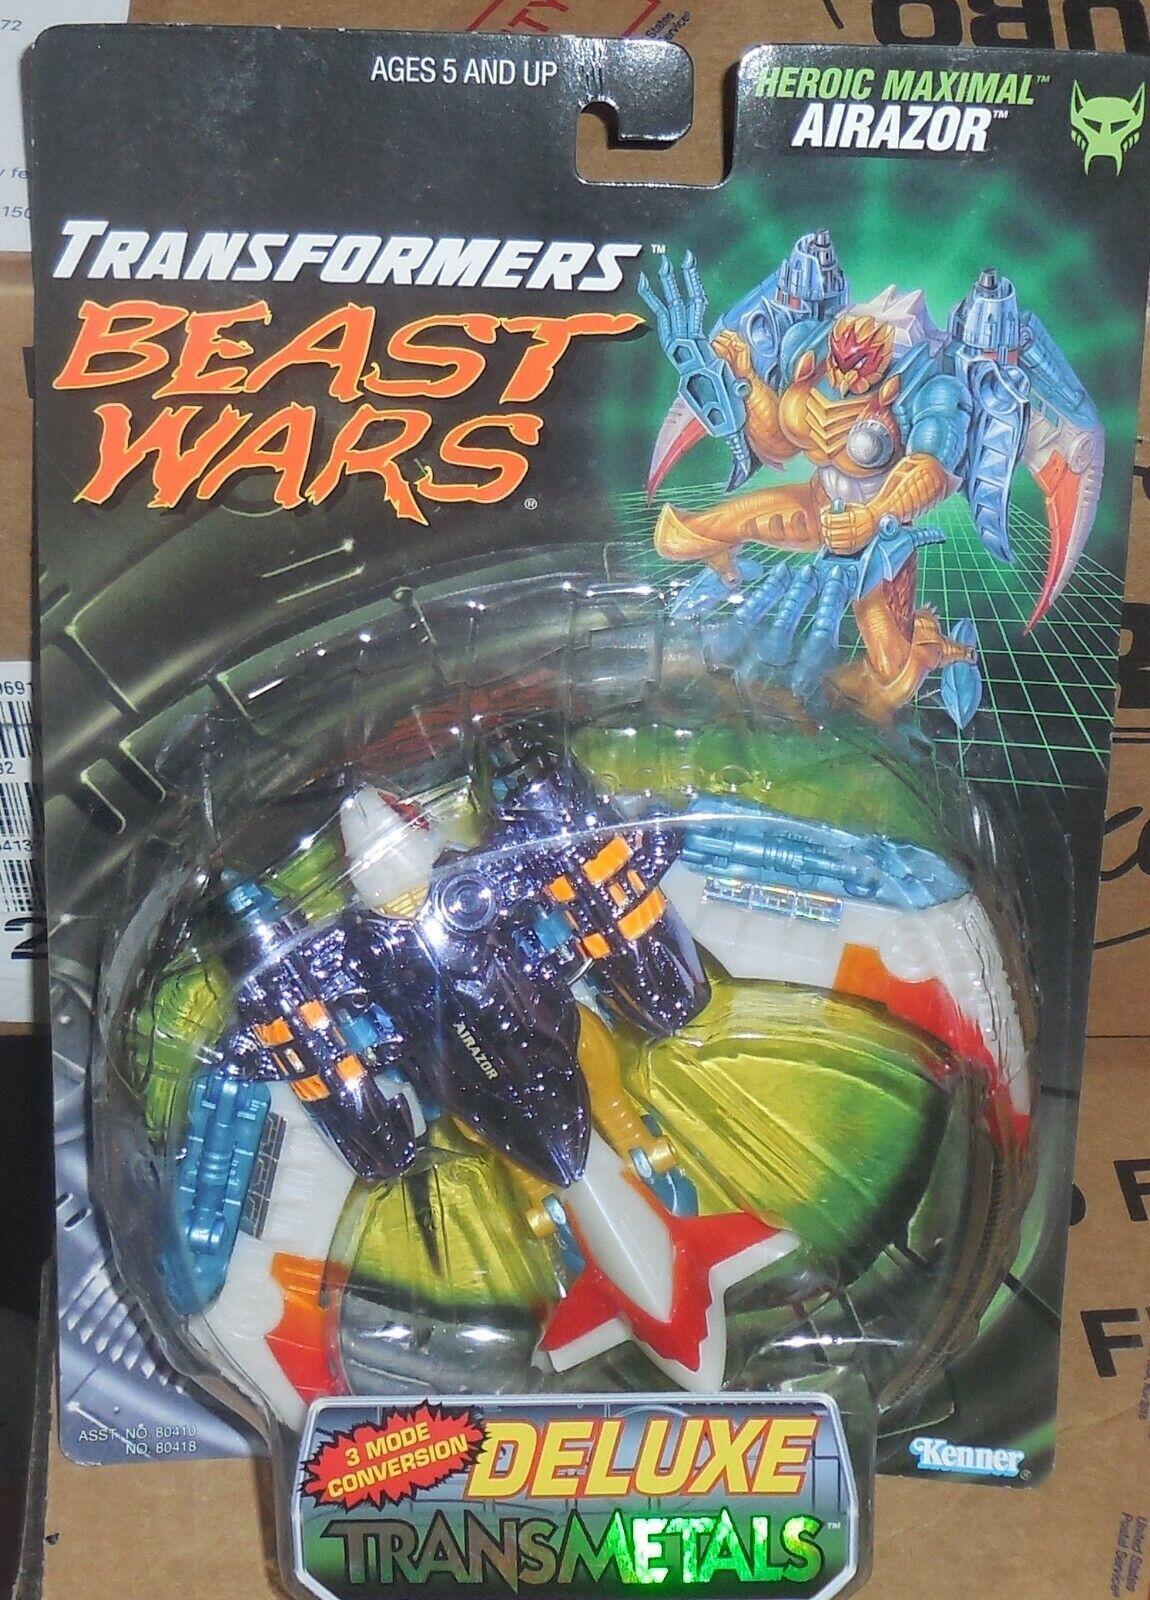 Transformers Bestia Guerre Transmetals Airazor Mosc Nuova Figura